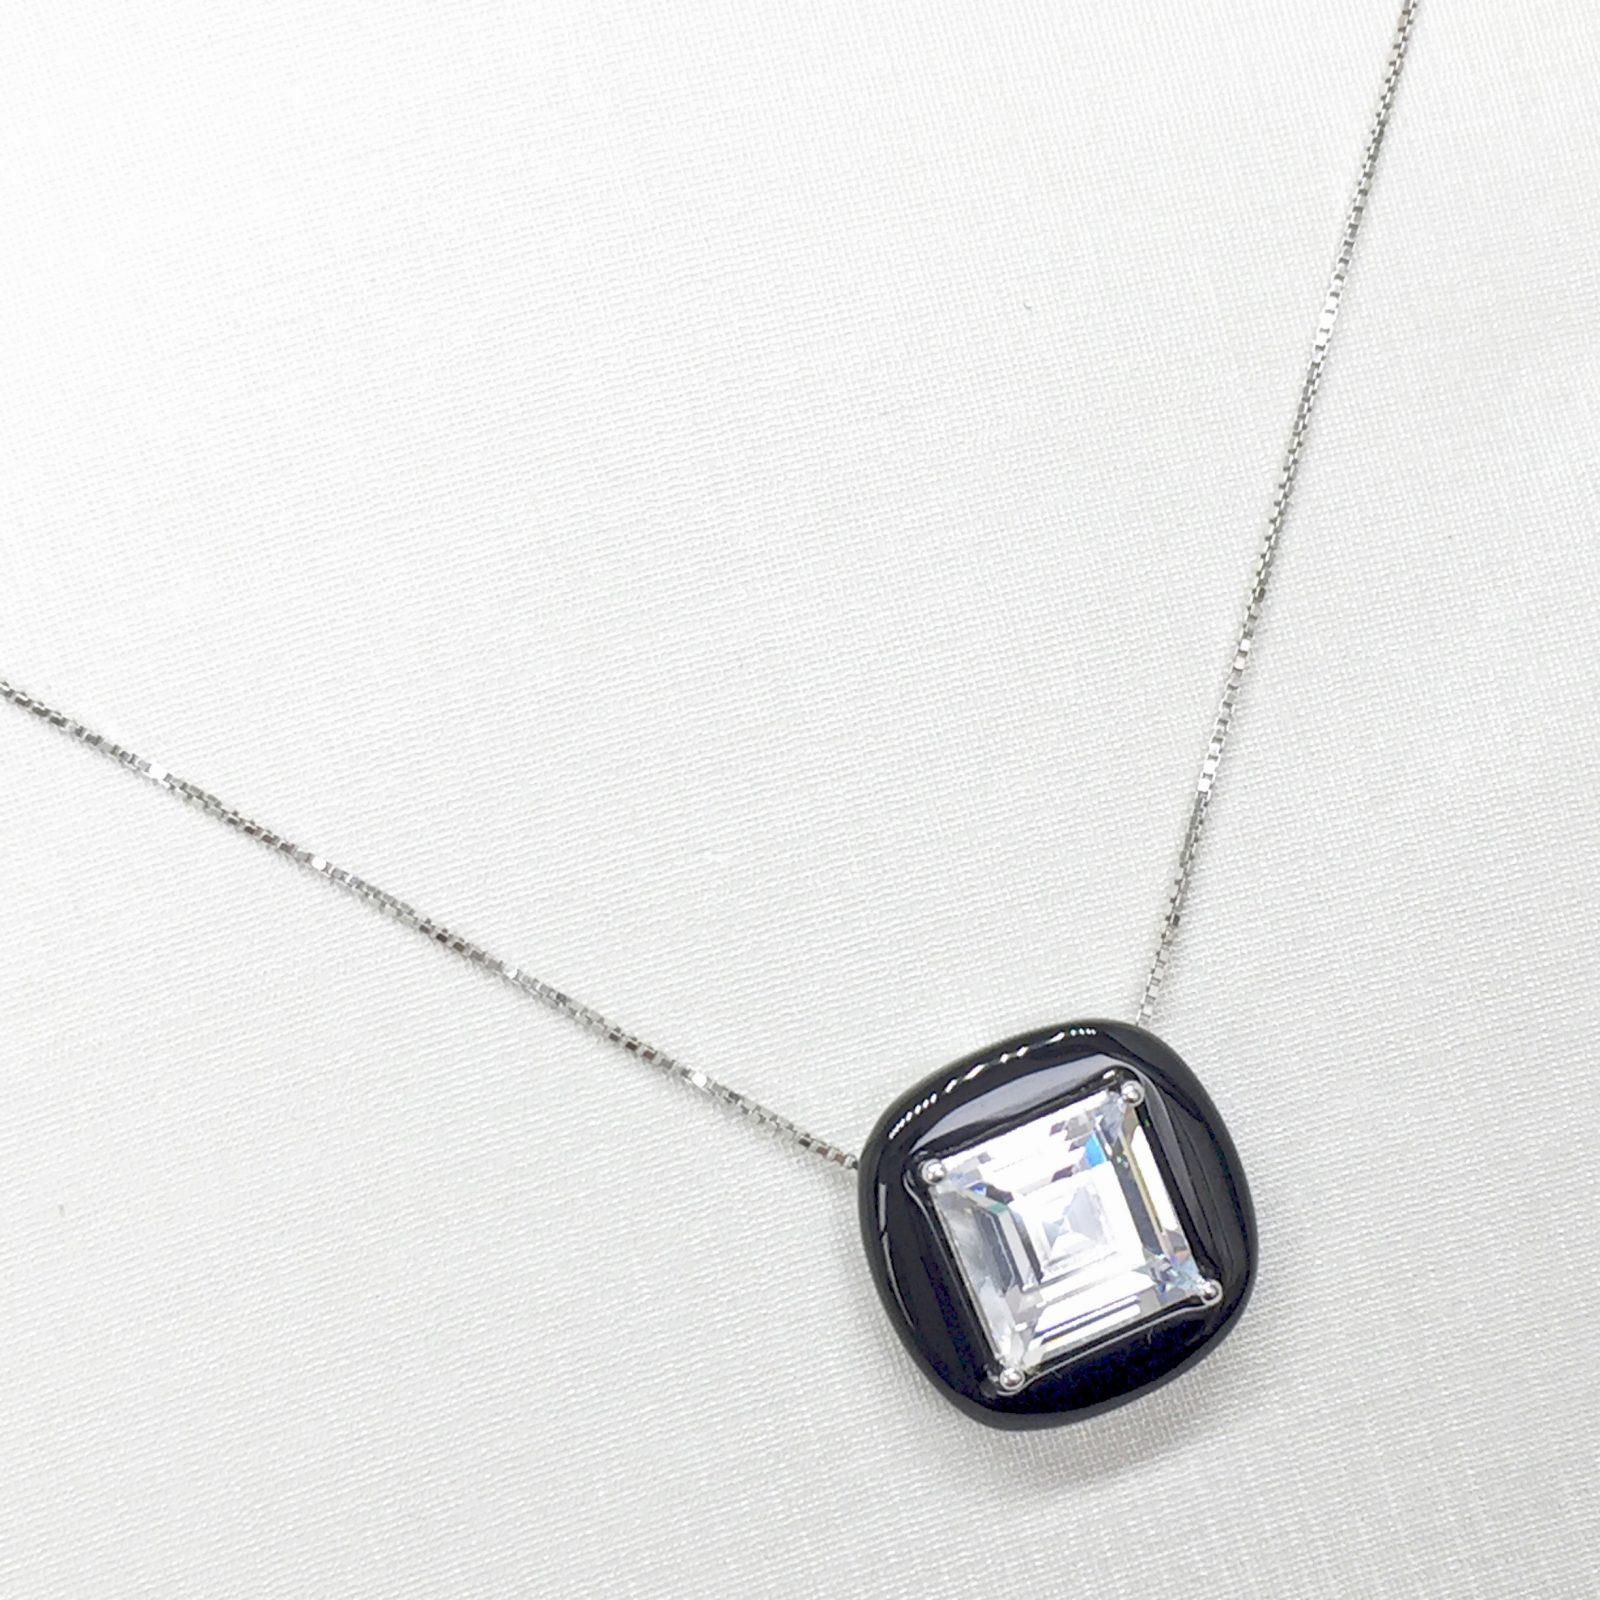 Colar Quadrado Zircônia Cristal | Lanarée Acessórios